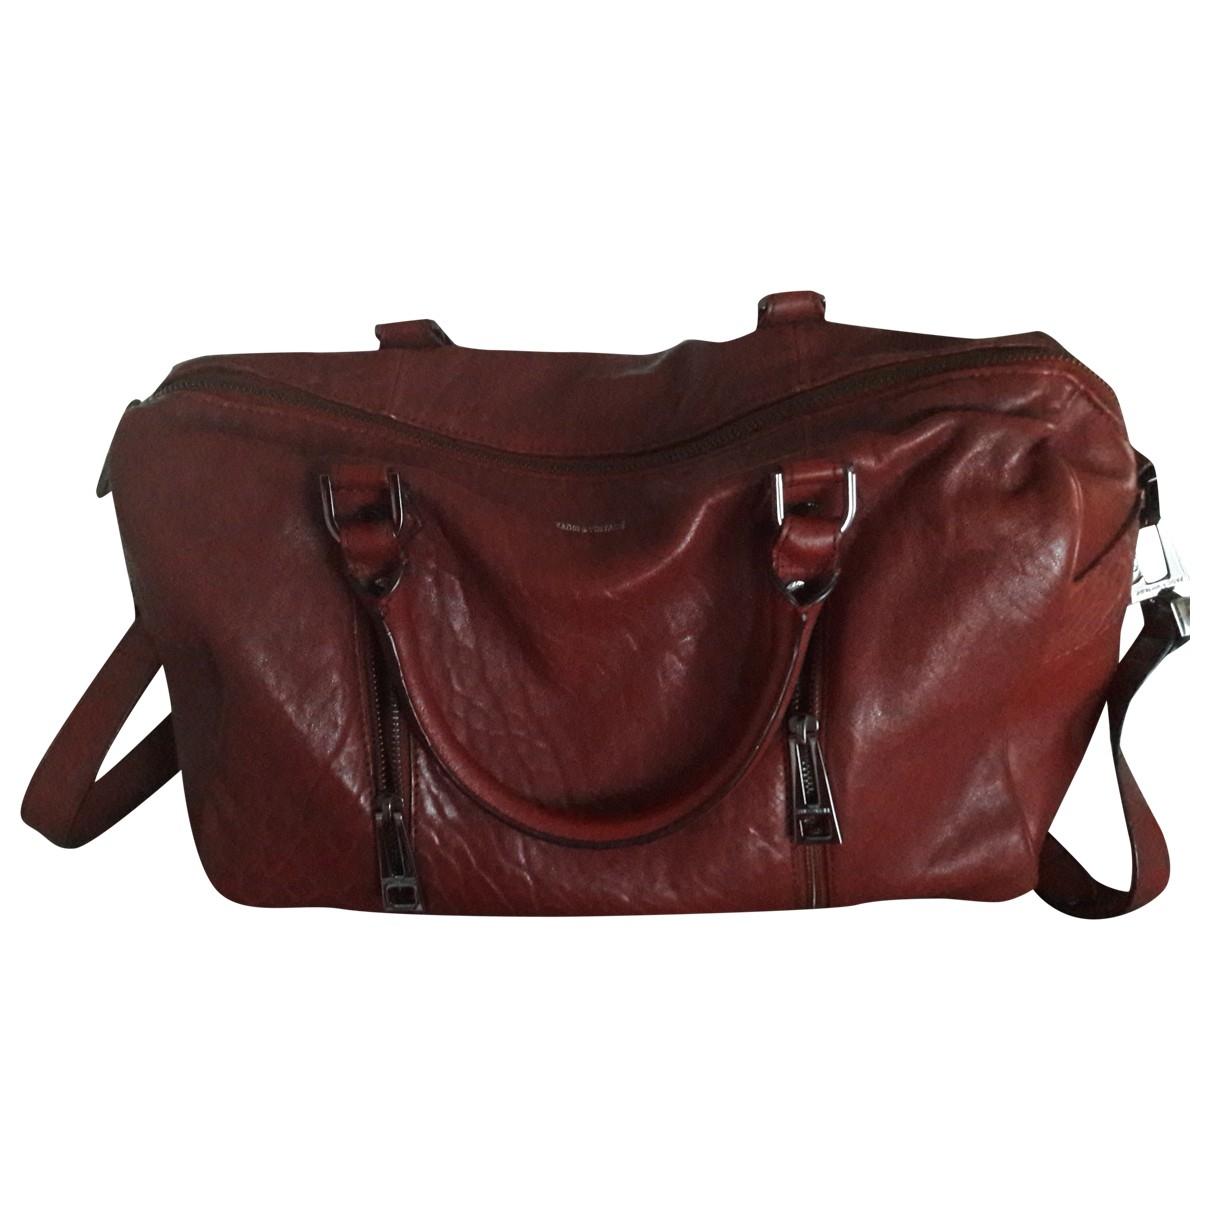 Zadig & Voltaire Sunny Burgundy Leather handbag for Women \N